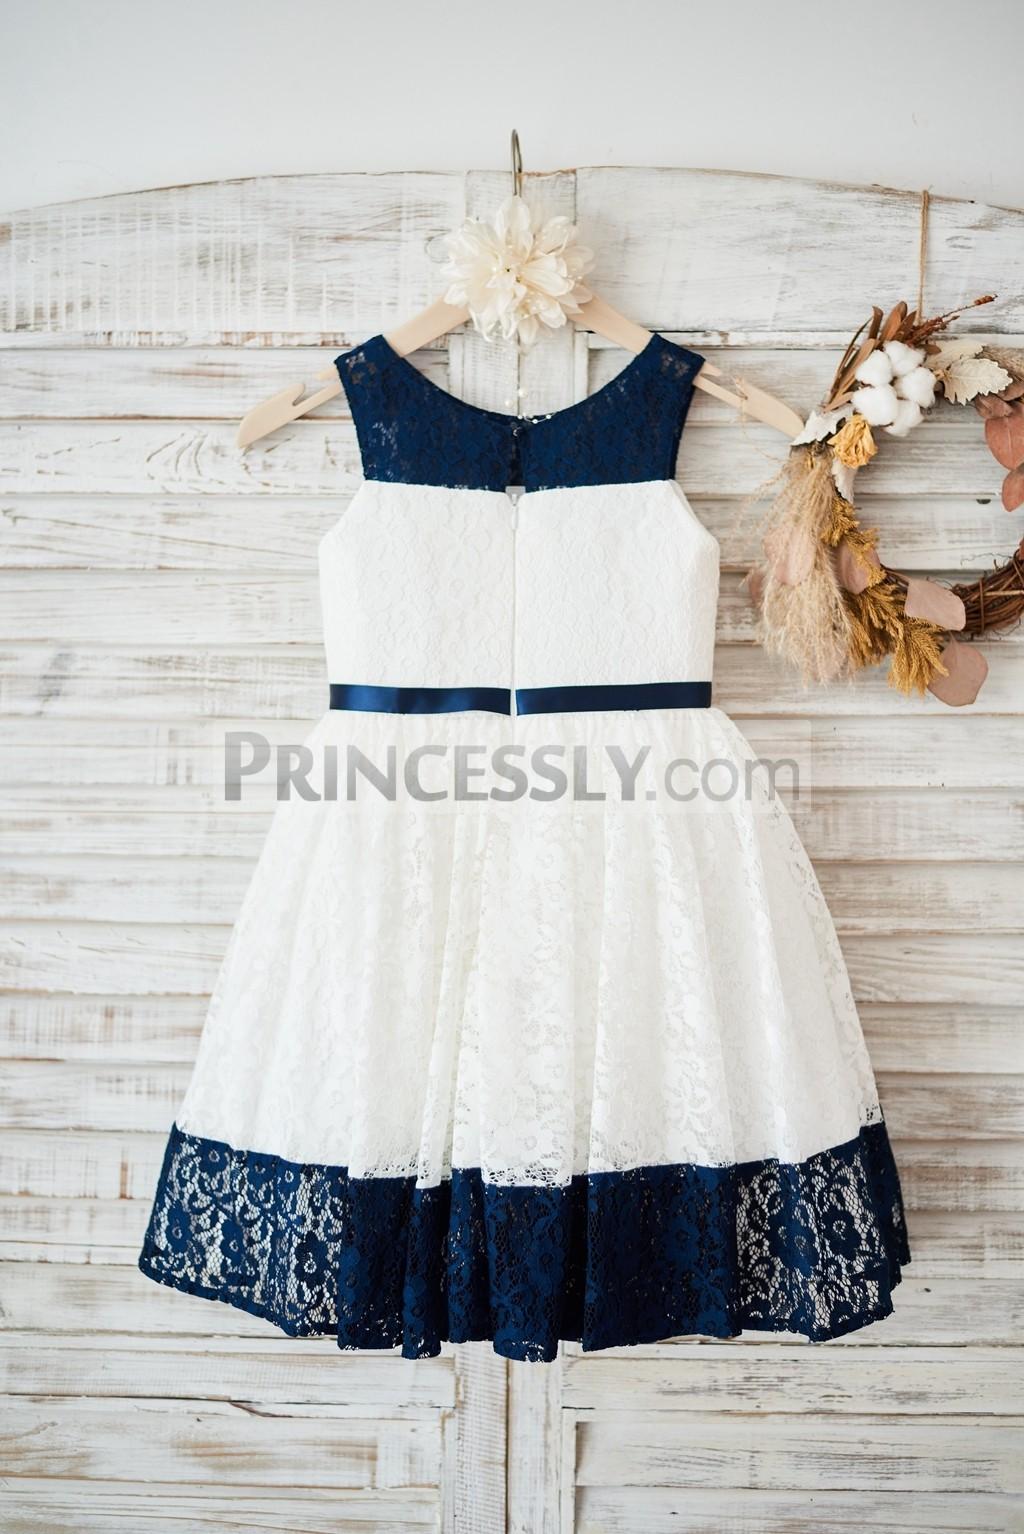 Scoop neck, sleeveless lace wedding baby girl dress